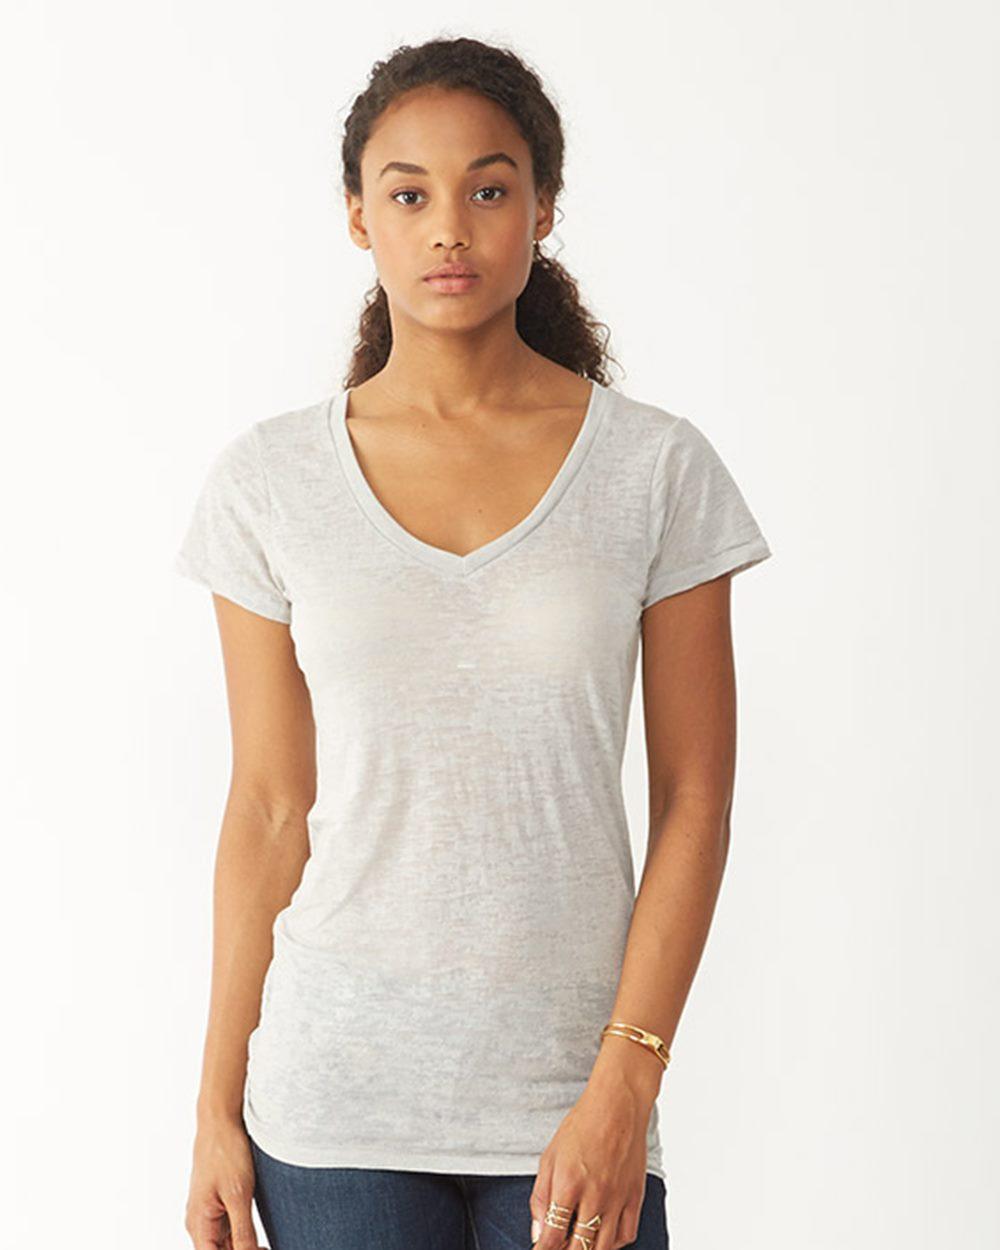 09deaedf5331 Alternative 2662 - Women s Diane Burnout V-Neck T-Shirt - Friendly ...